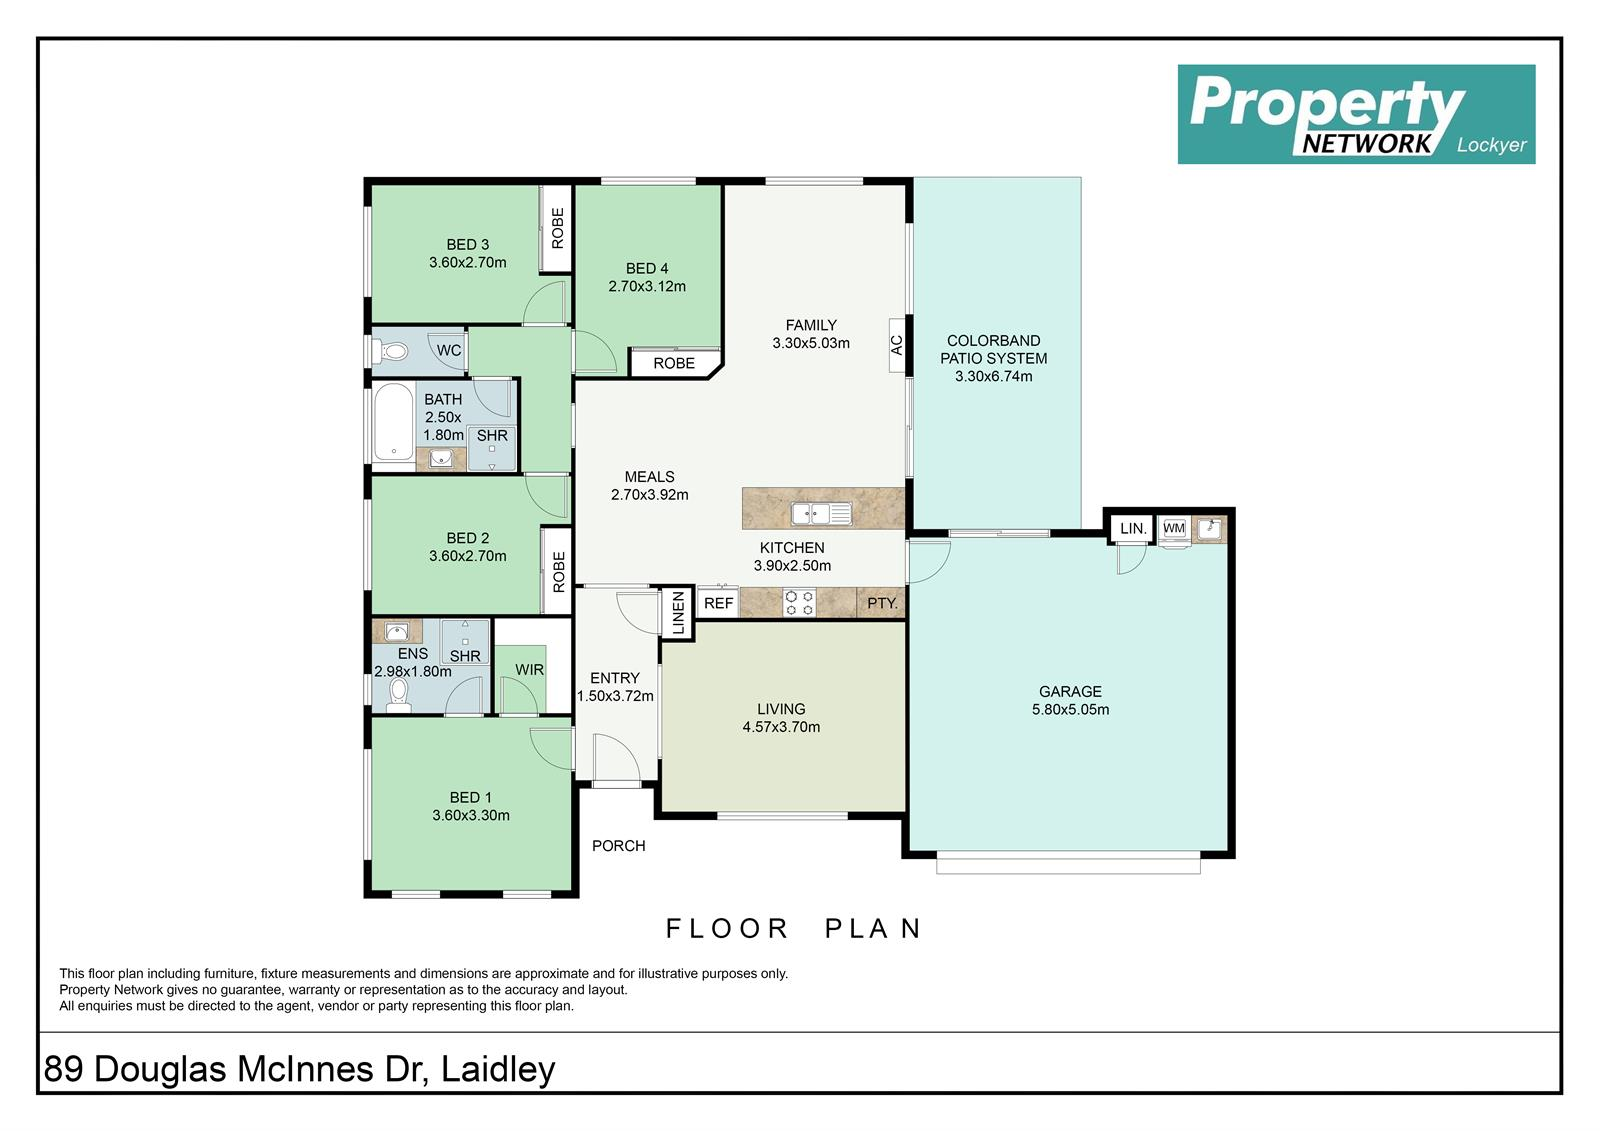 89 Douglas McInnes Drrive LAIDLEY QLD 4341 Floorplan 1